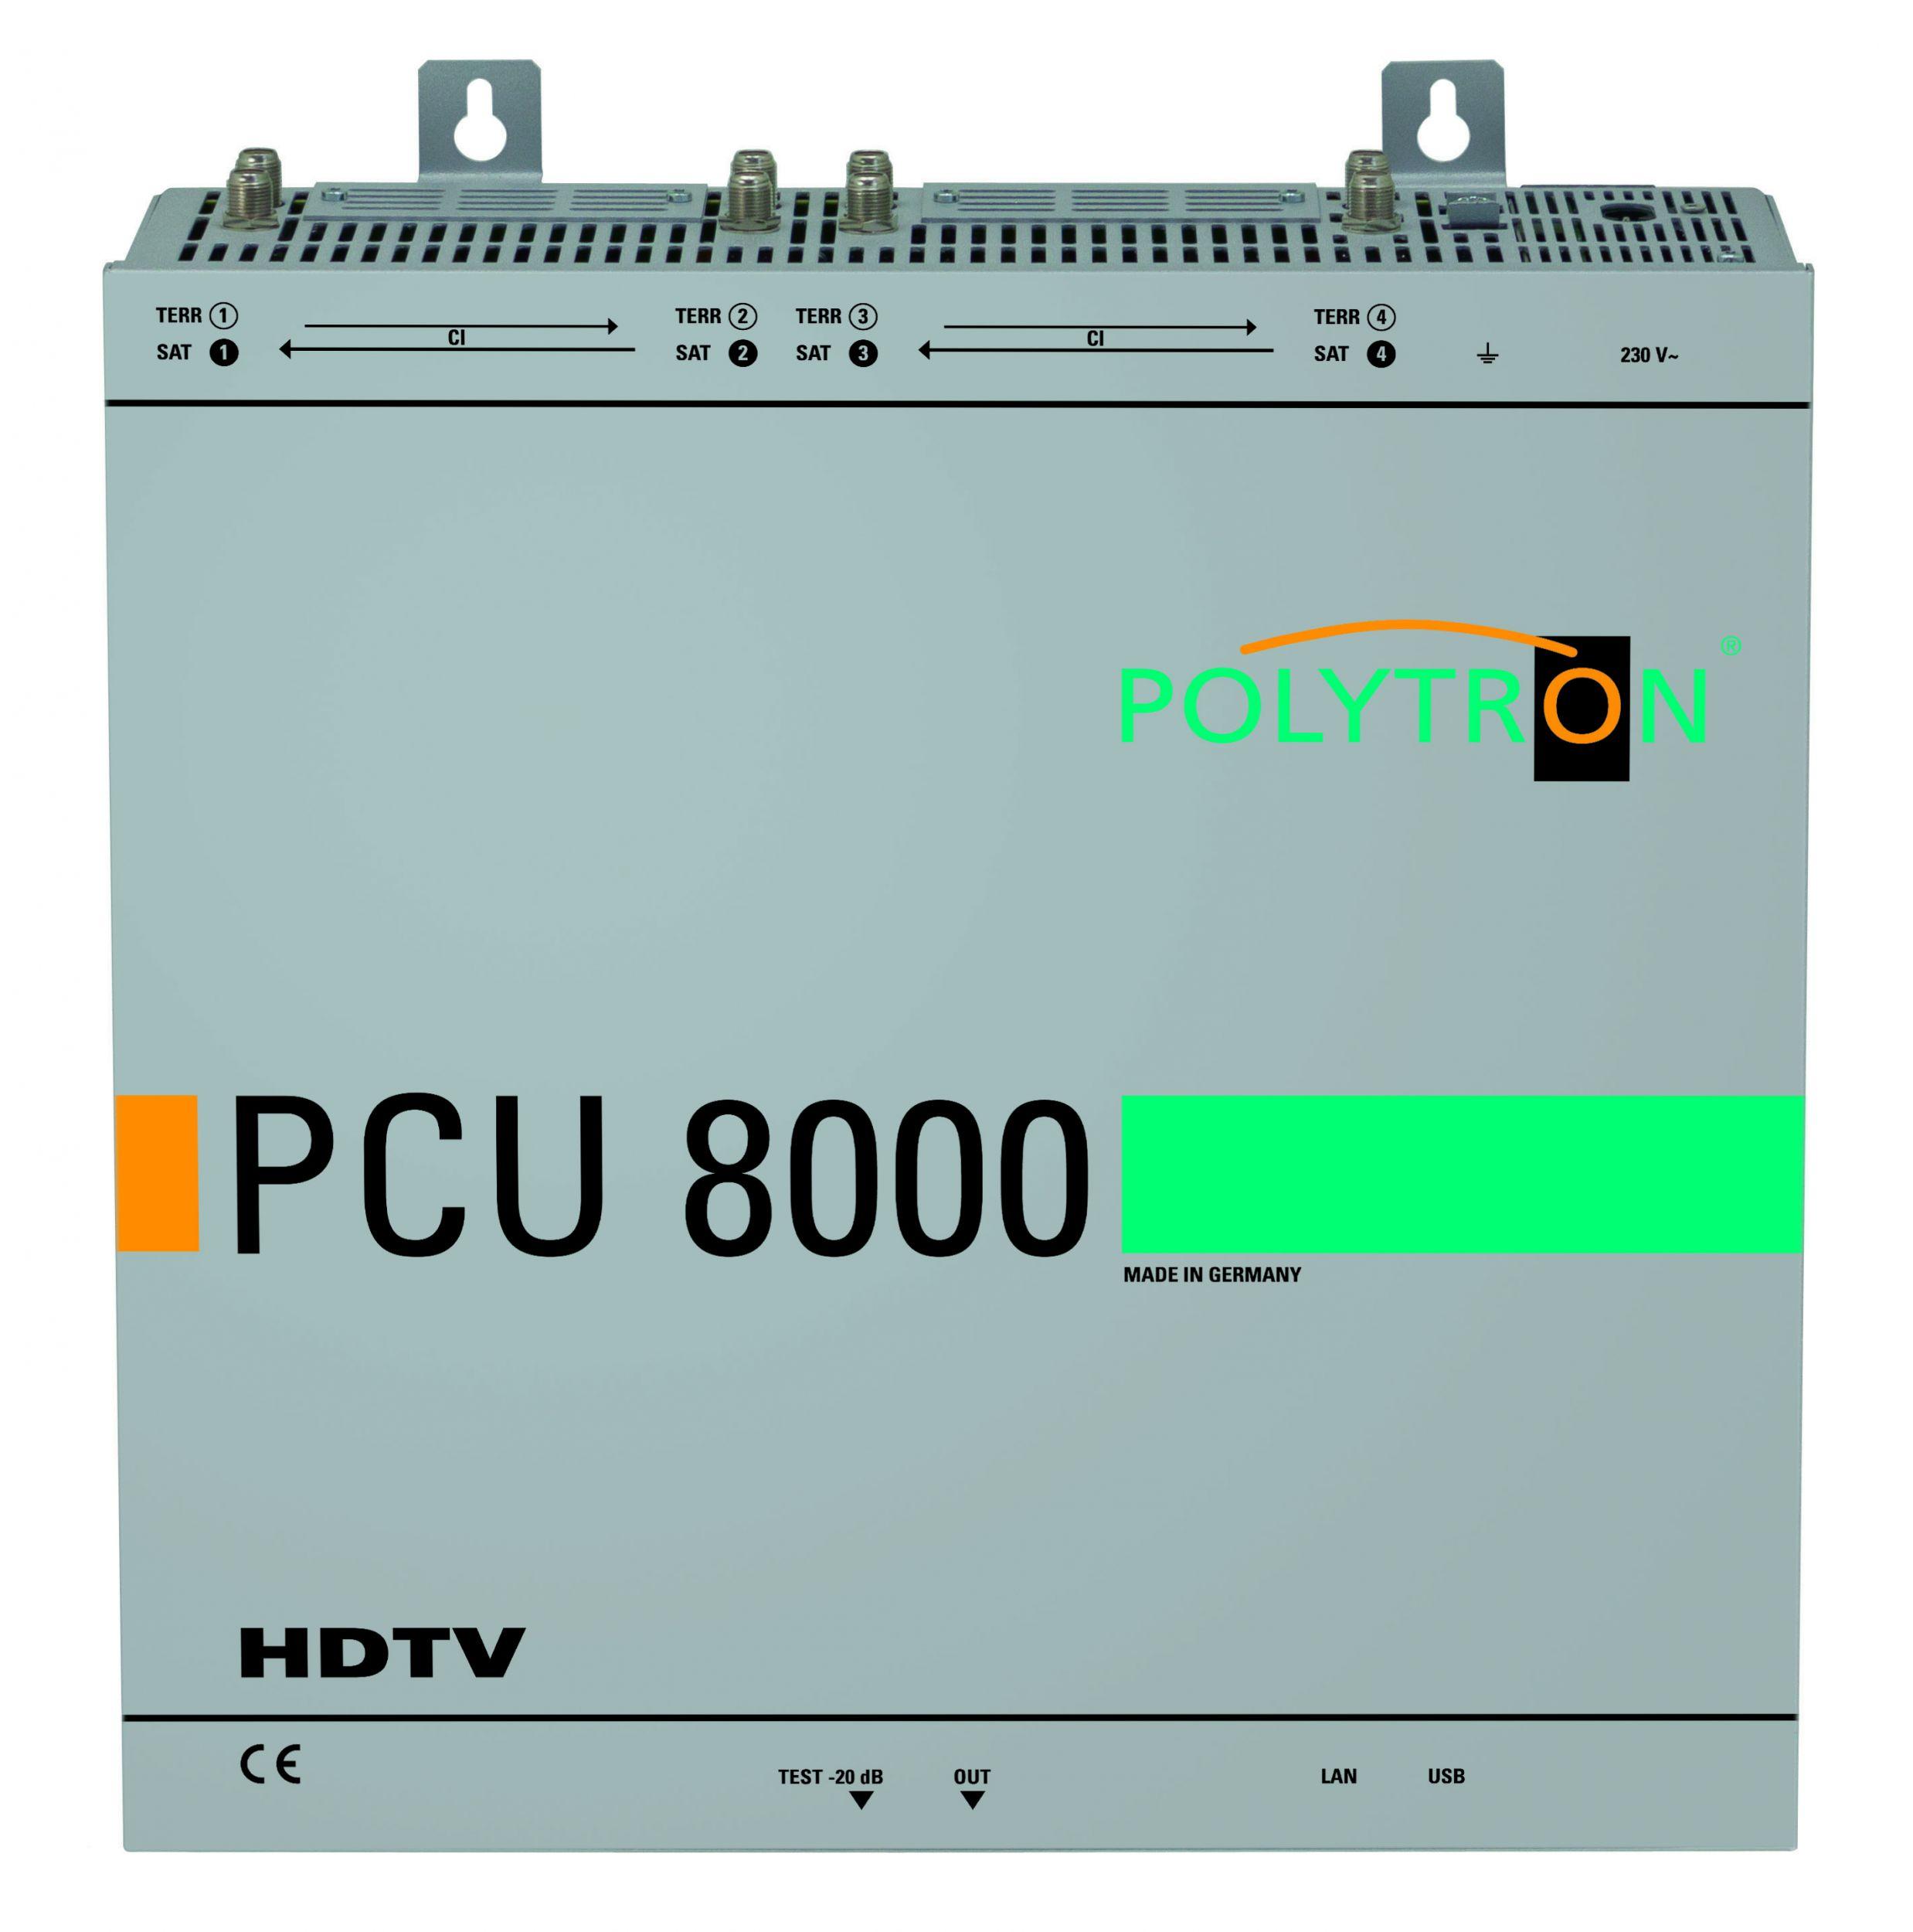 Kompakte HDTV-Kopfstellen